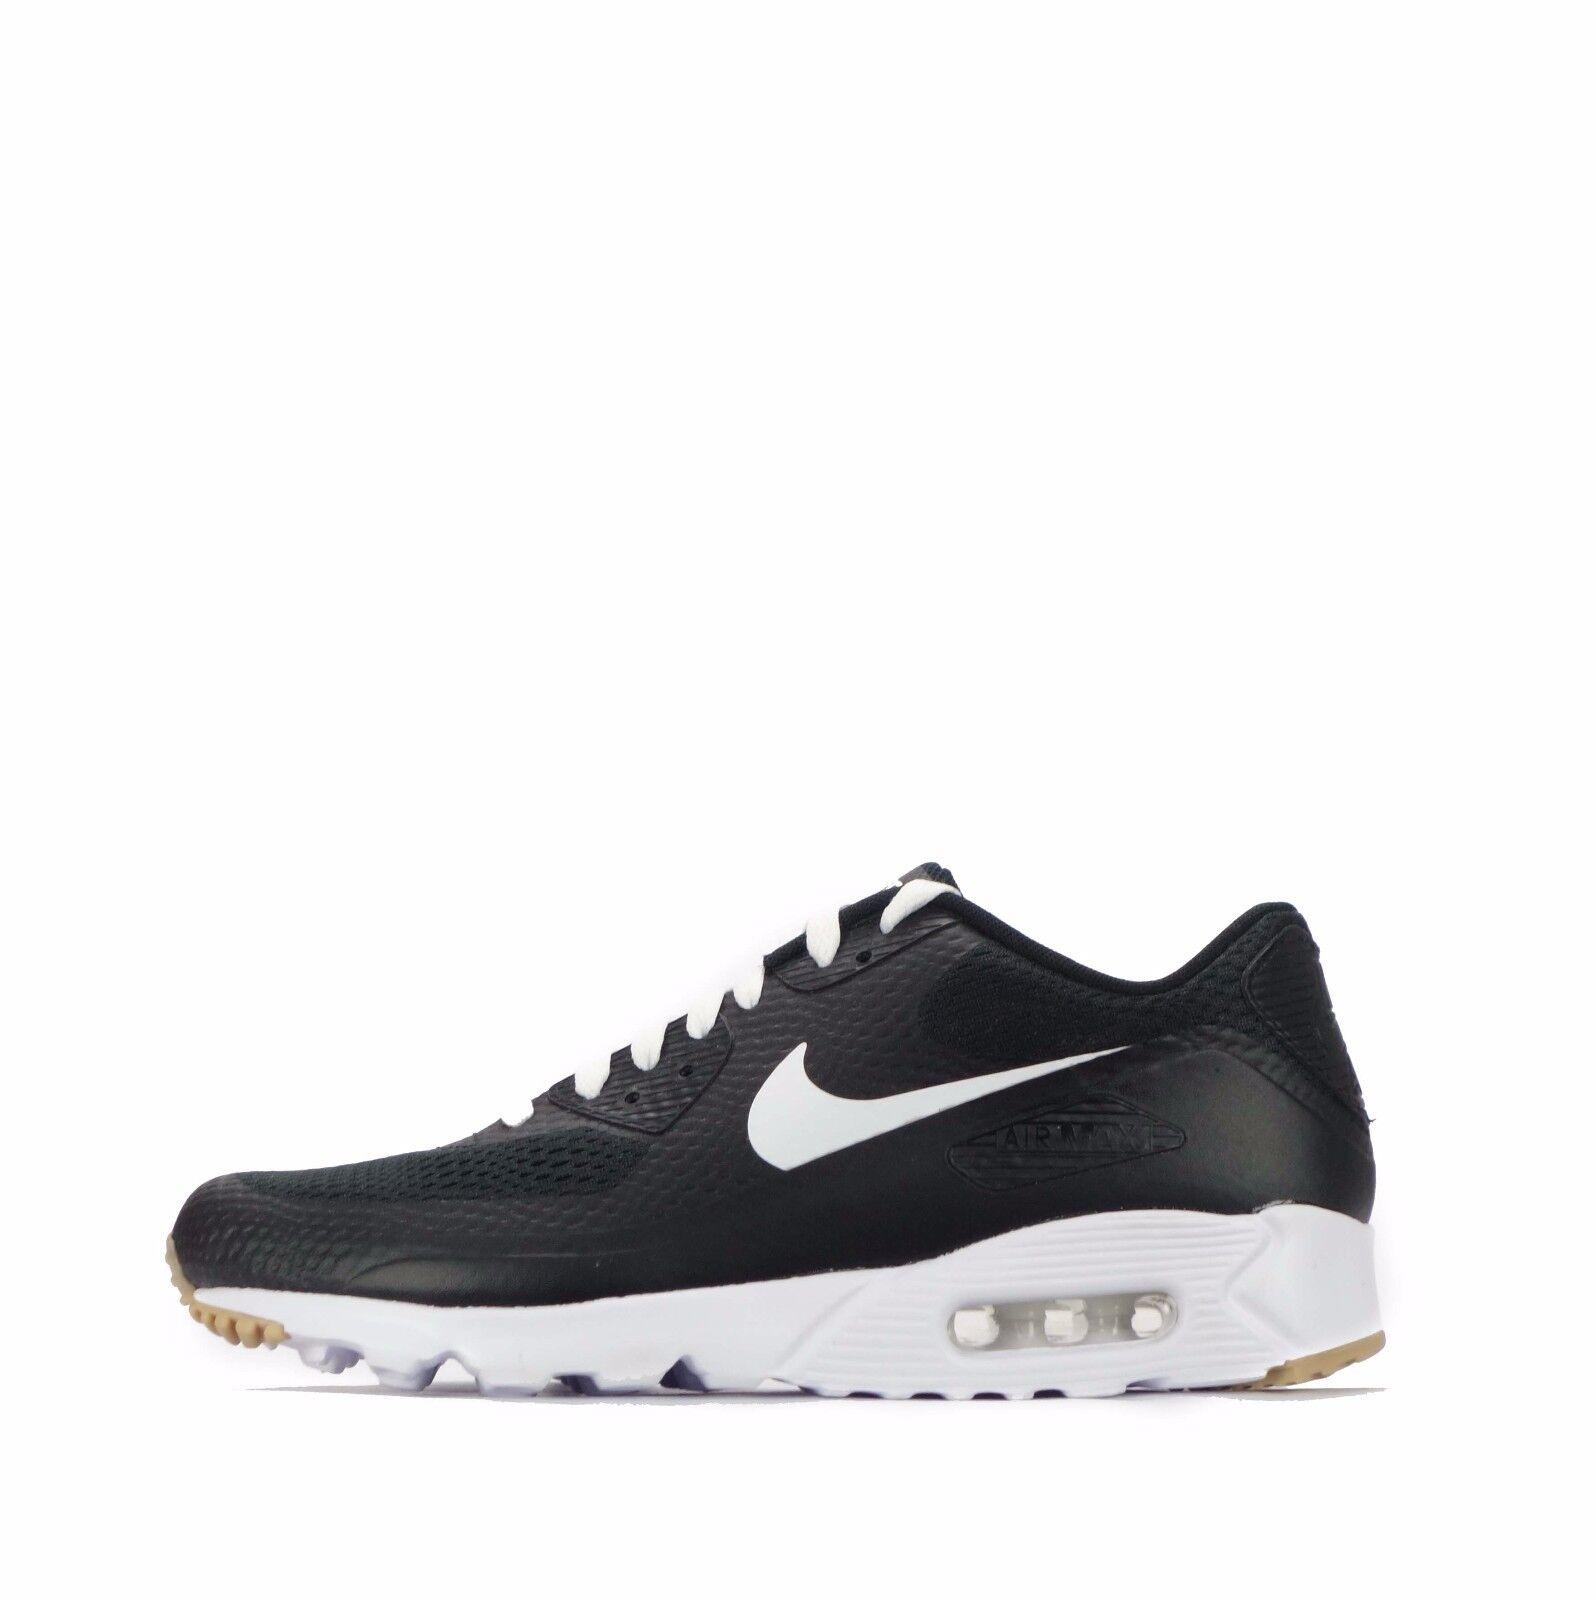 Nike Air Max 90 Ultra ESSENTIEL Chaussures Hommes Noir/Blanc